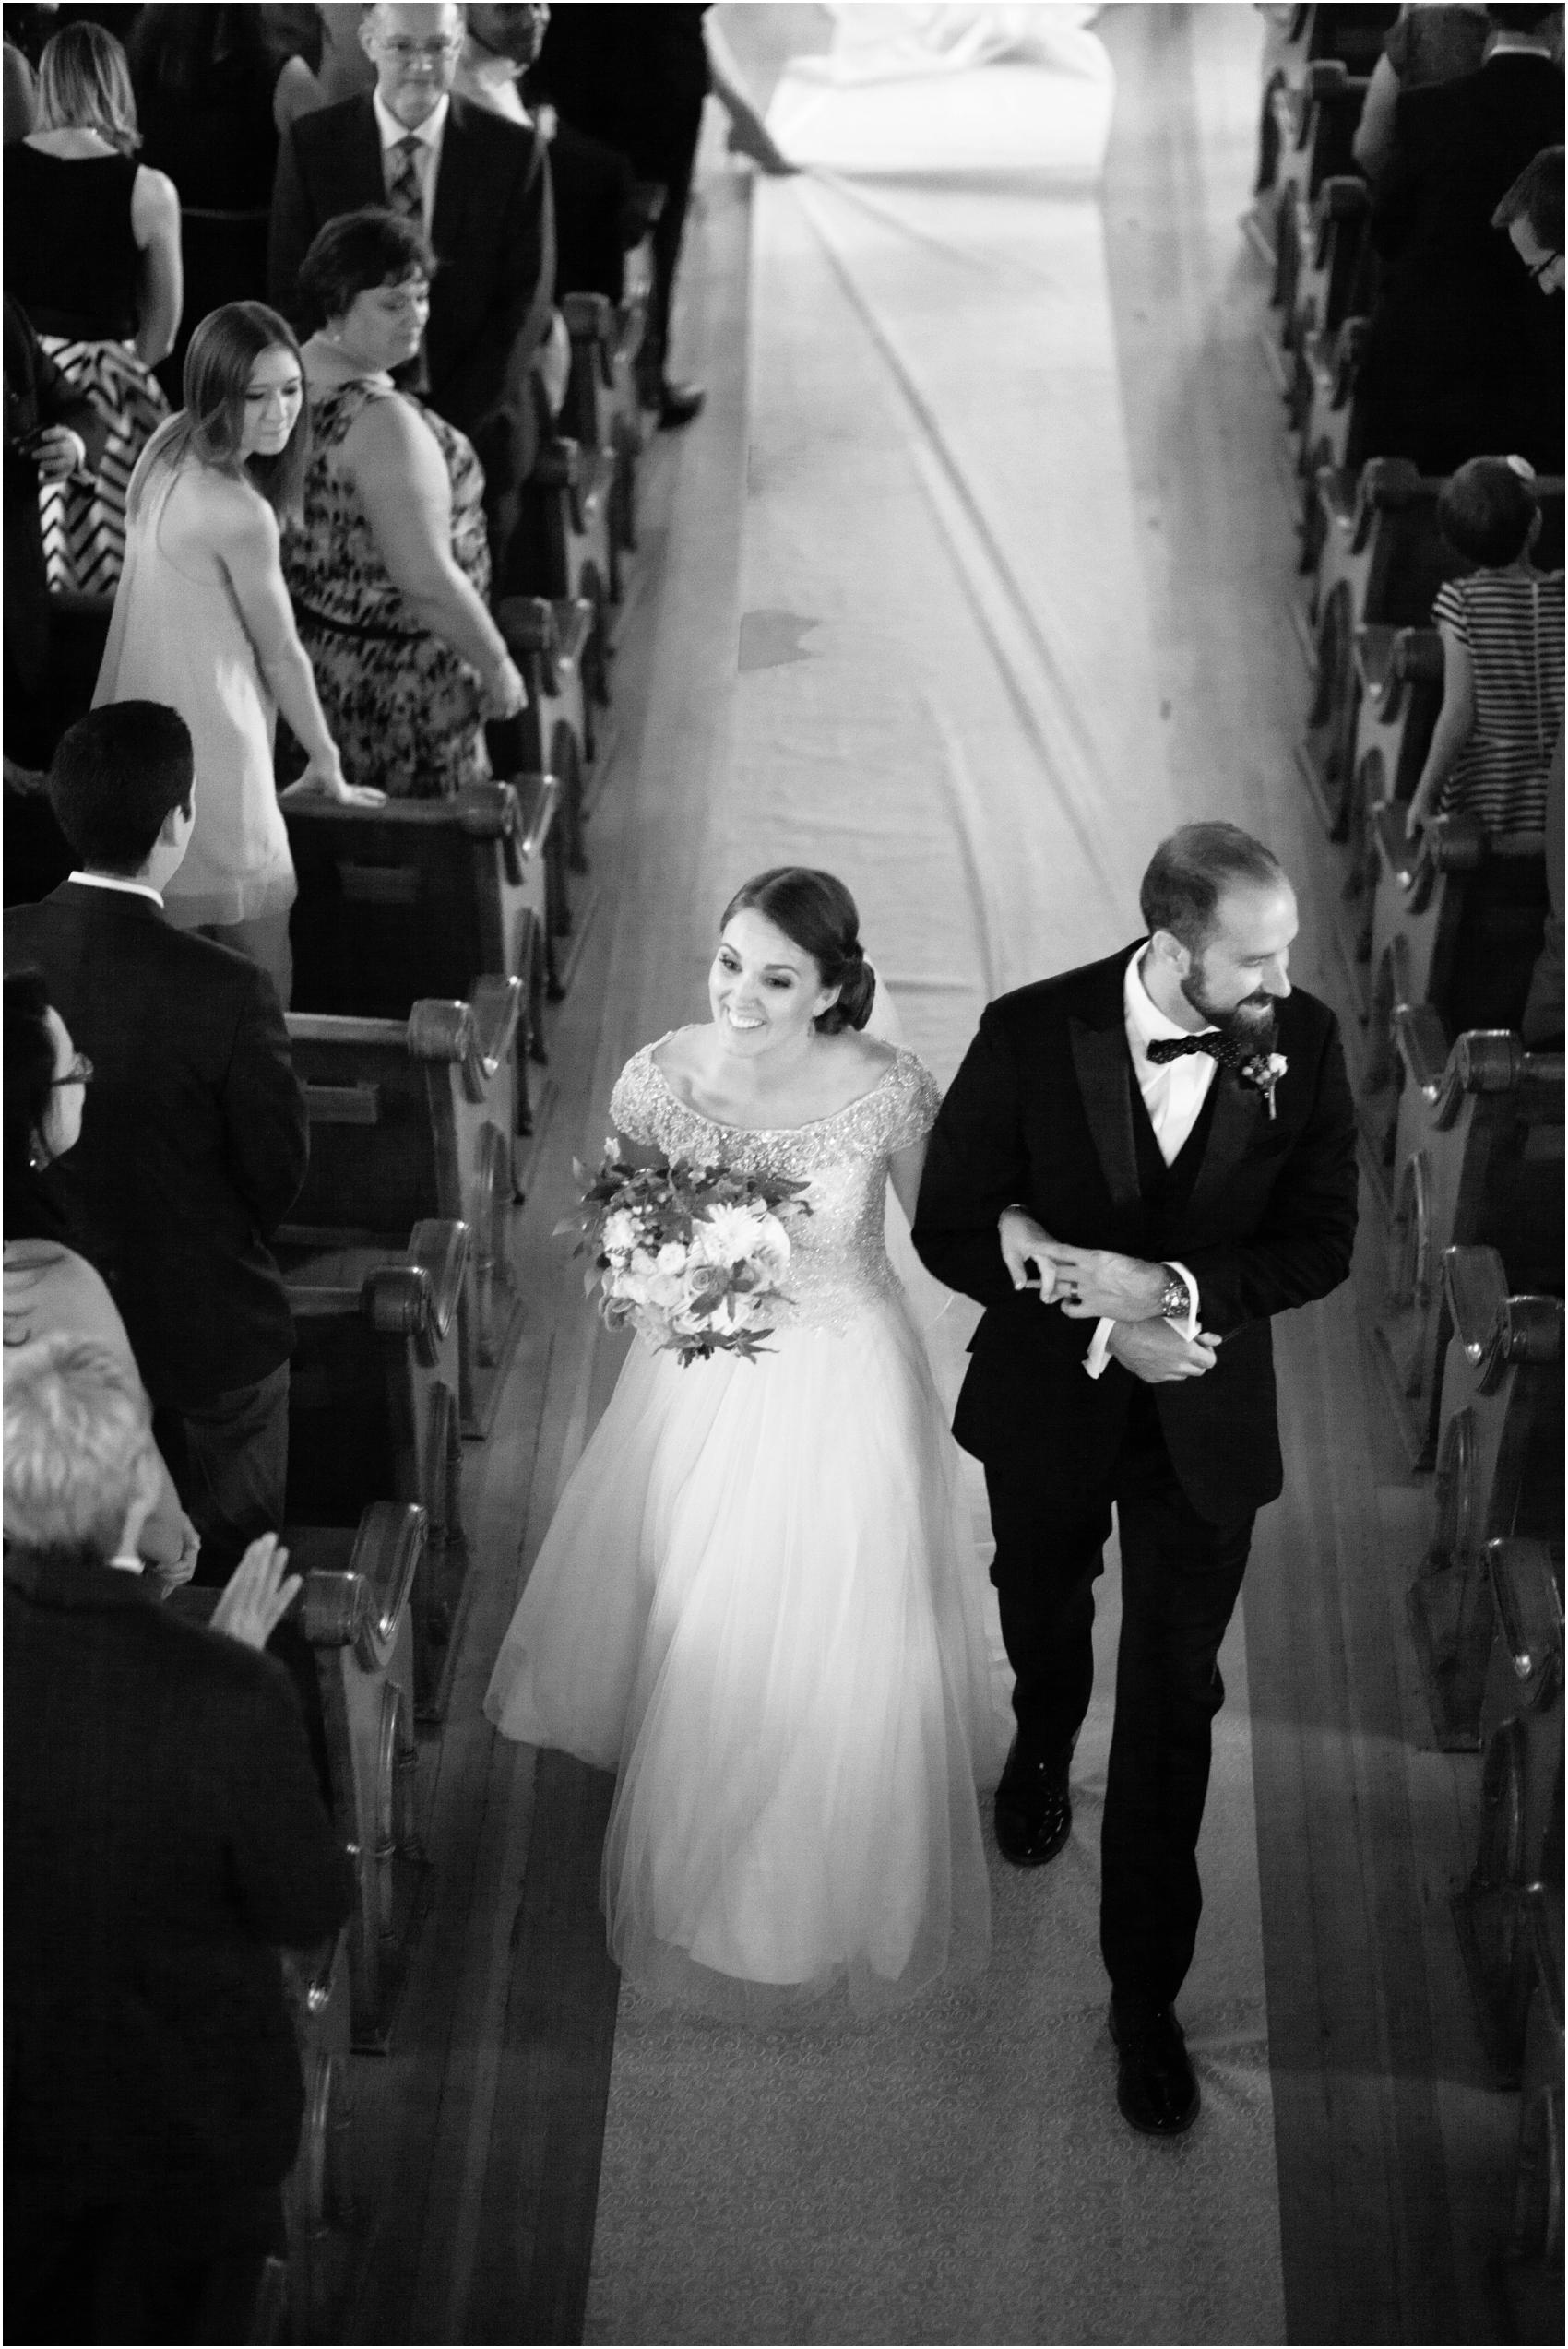 Old-Metropolitan-Hall-Wedding-Charlottesville-Virginia-447.jpg